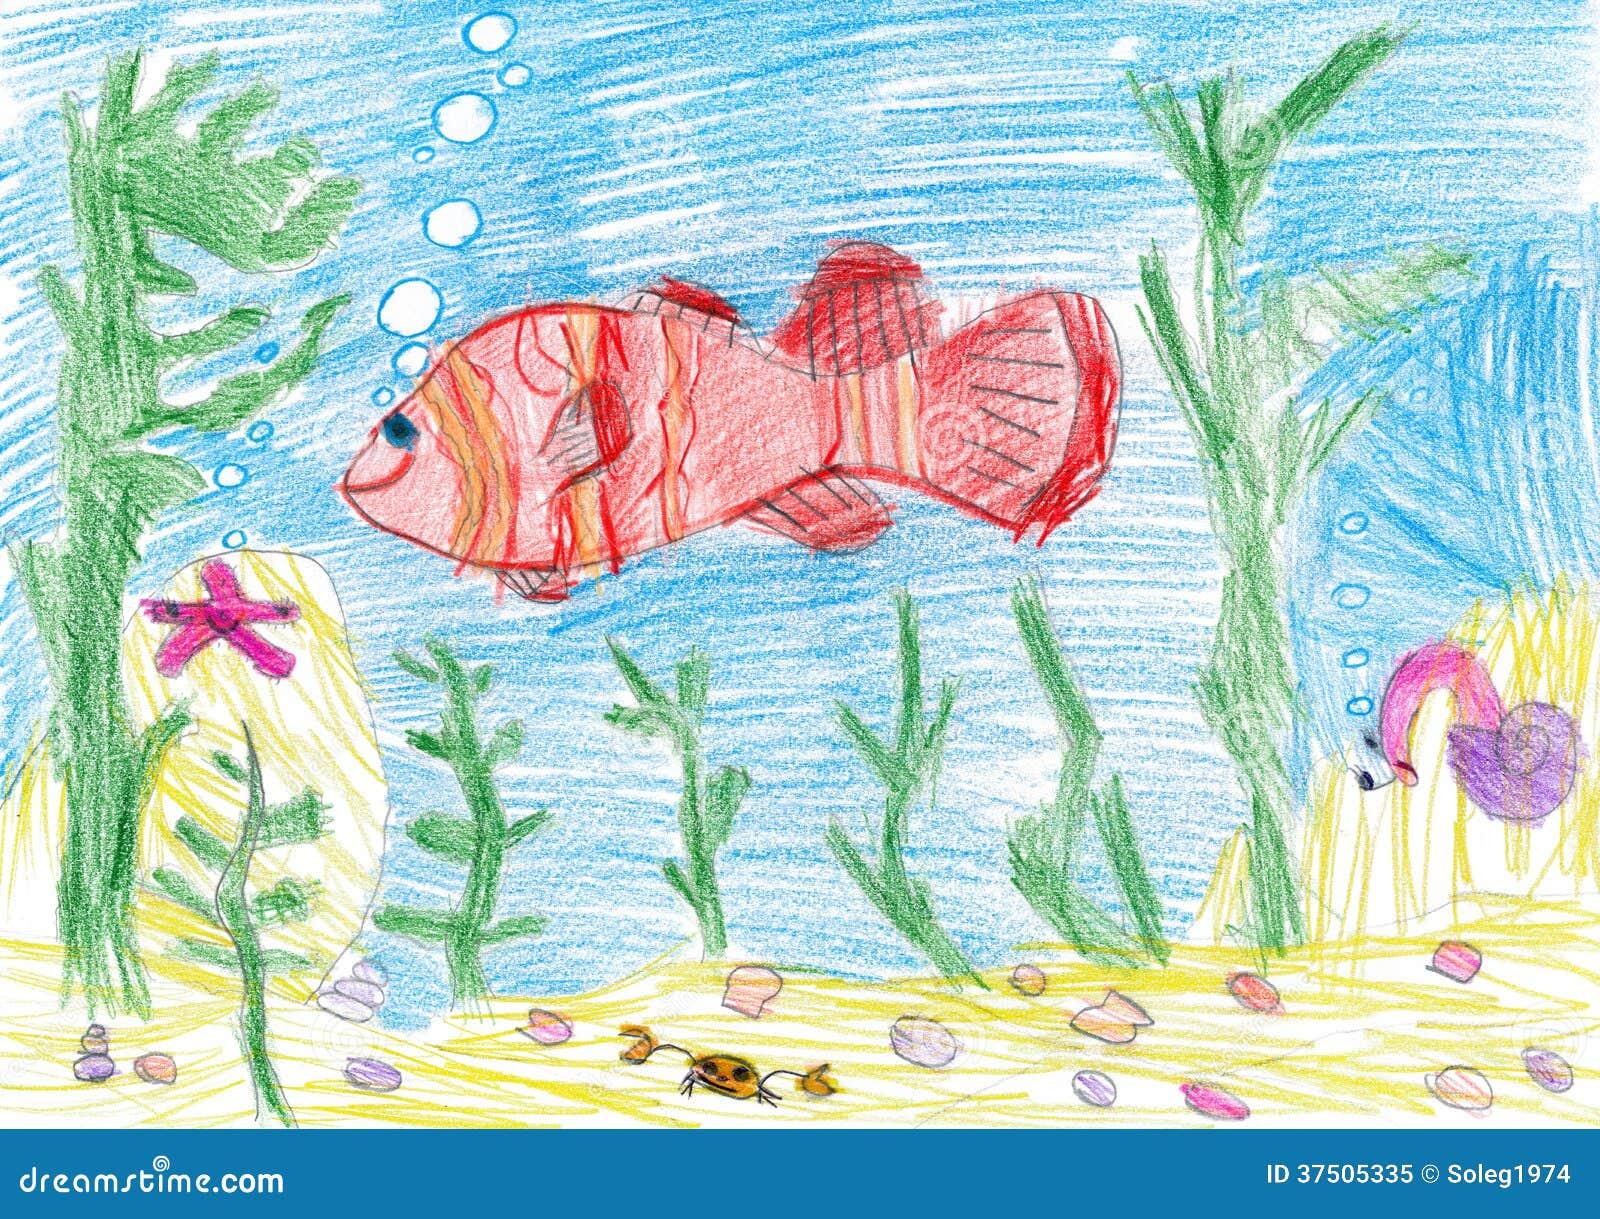 Realistic Kids Drawings